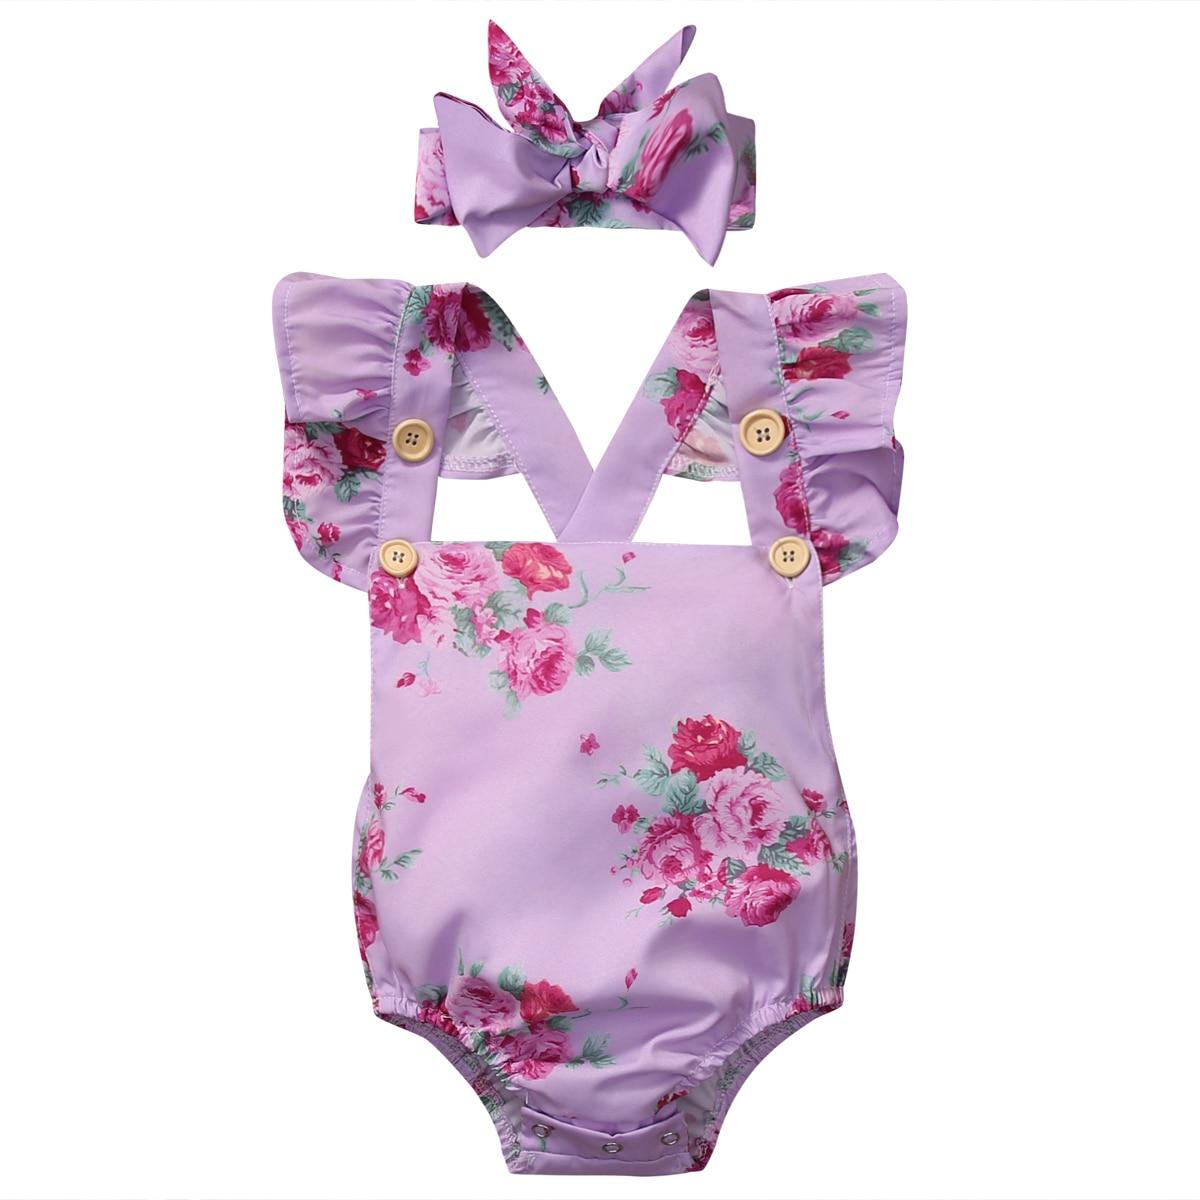 2Pcs sets Newborn Baby Girls Clothes Floral Jumpsuit Bodysuit+Headband Summer Toddler Girls Cotton Sunsuits